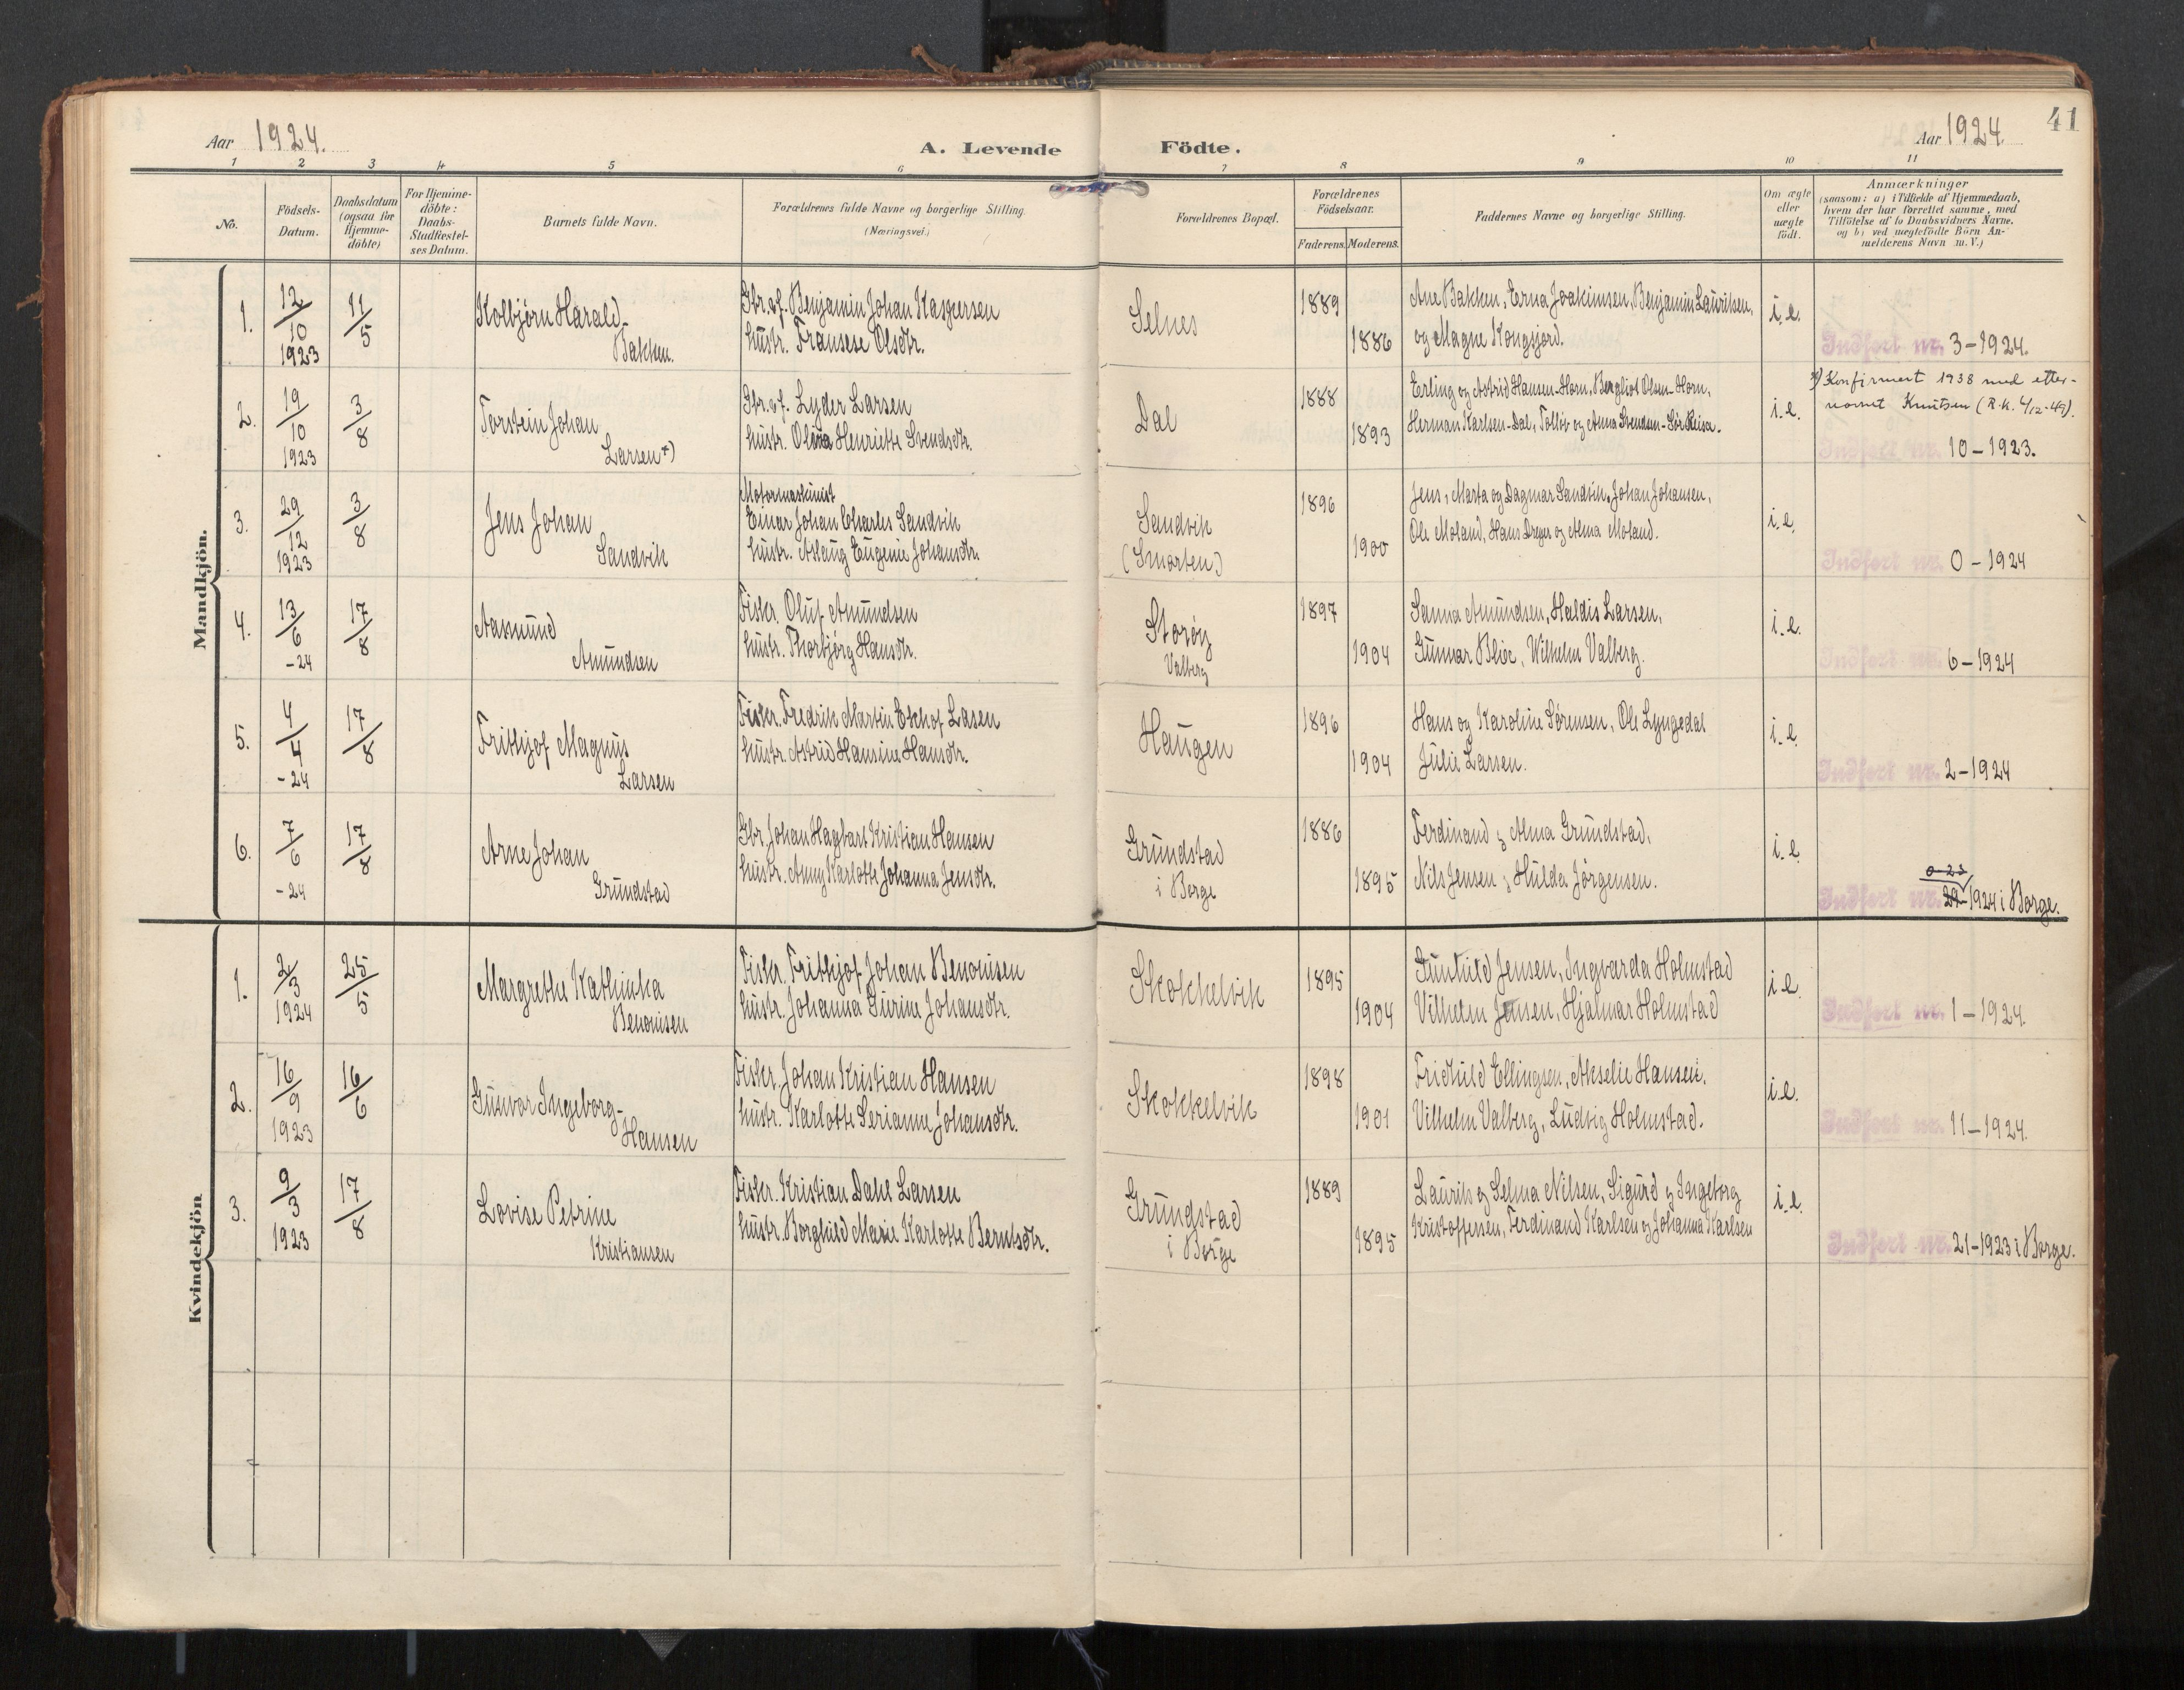 SAT, Ministerialprotokoller, klokkerbøker og fødselsregistre - Nordland, 884/L1194: Ministerialbok nr. 884A02, 1906-1937, s. 41